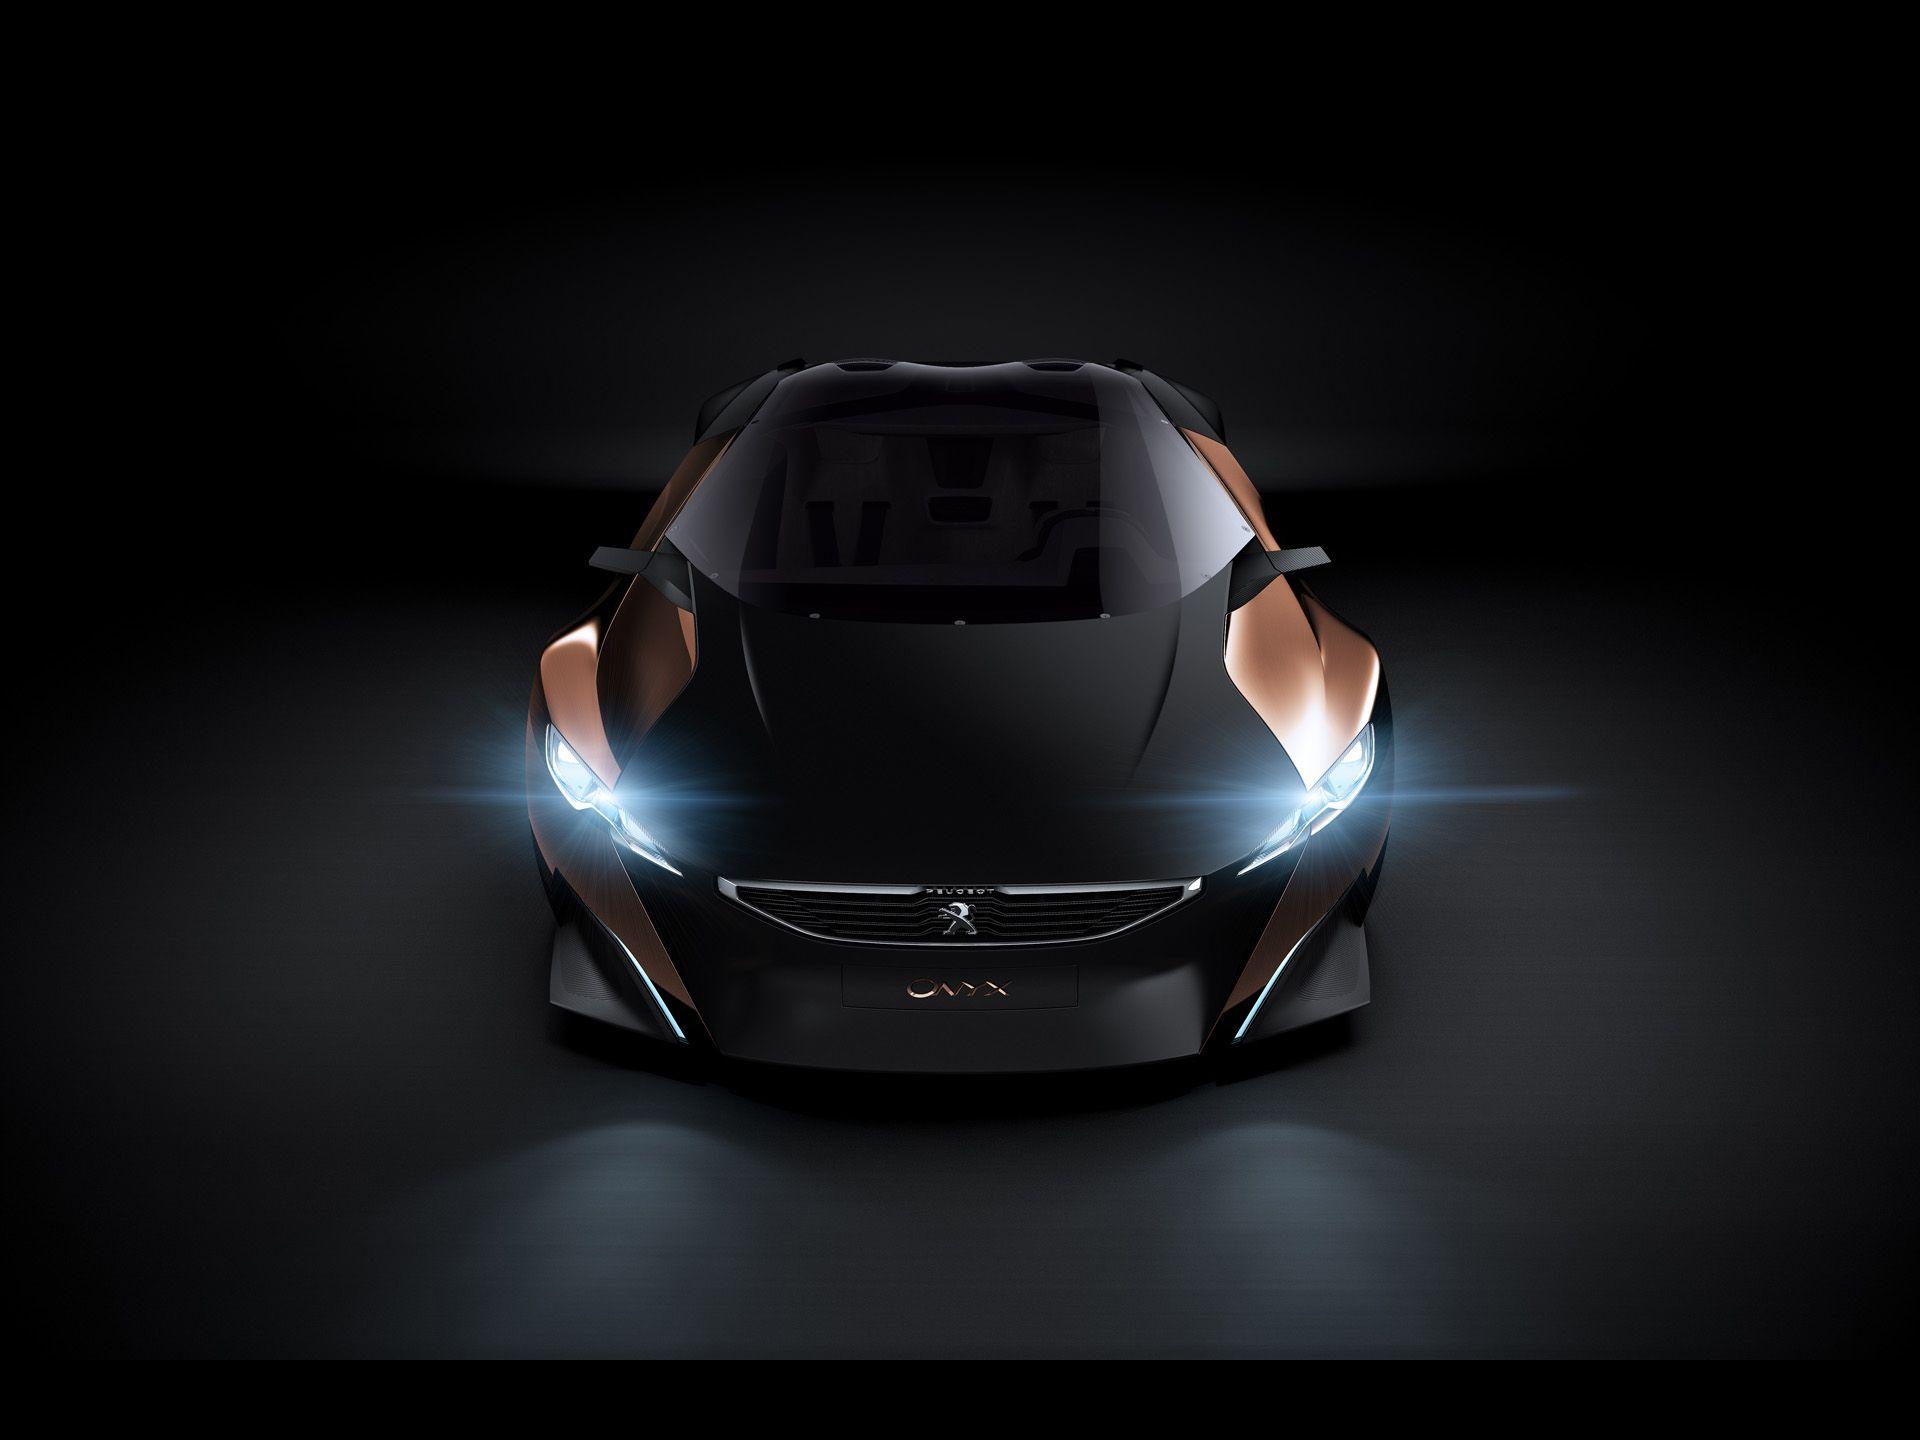 2012-peugeot-onyx-concept-stud-552731a2cd0b4.jpg | CARS | Pinterest ...